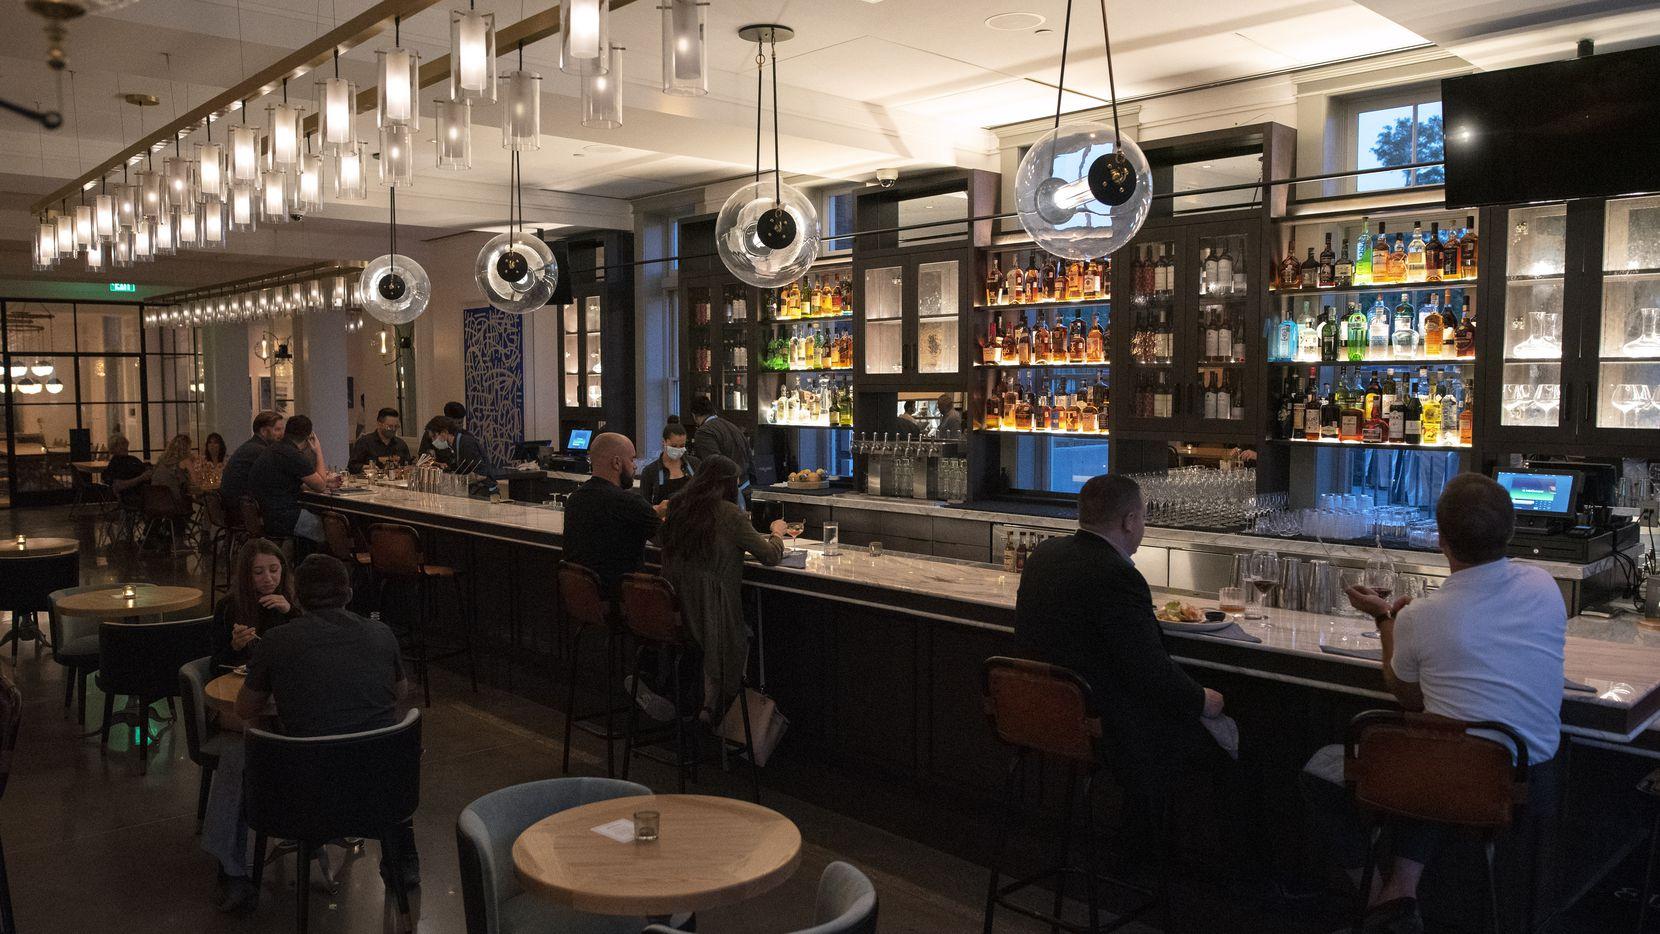 Elm & Good is located inside the new Kimpton Pittman Hotel in Deep Ellum. It opens Aug. 12, 2020.